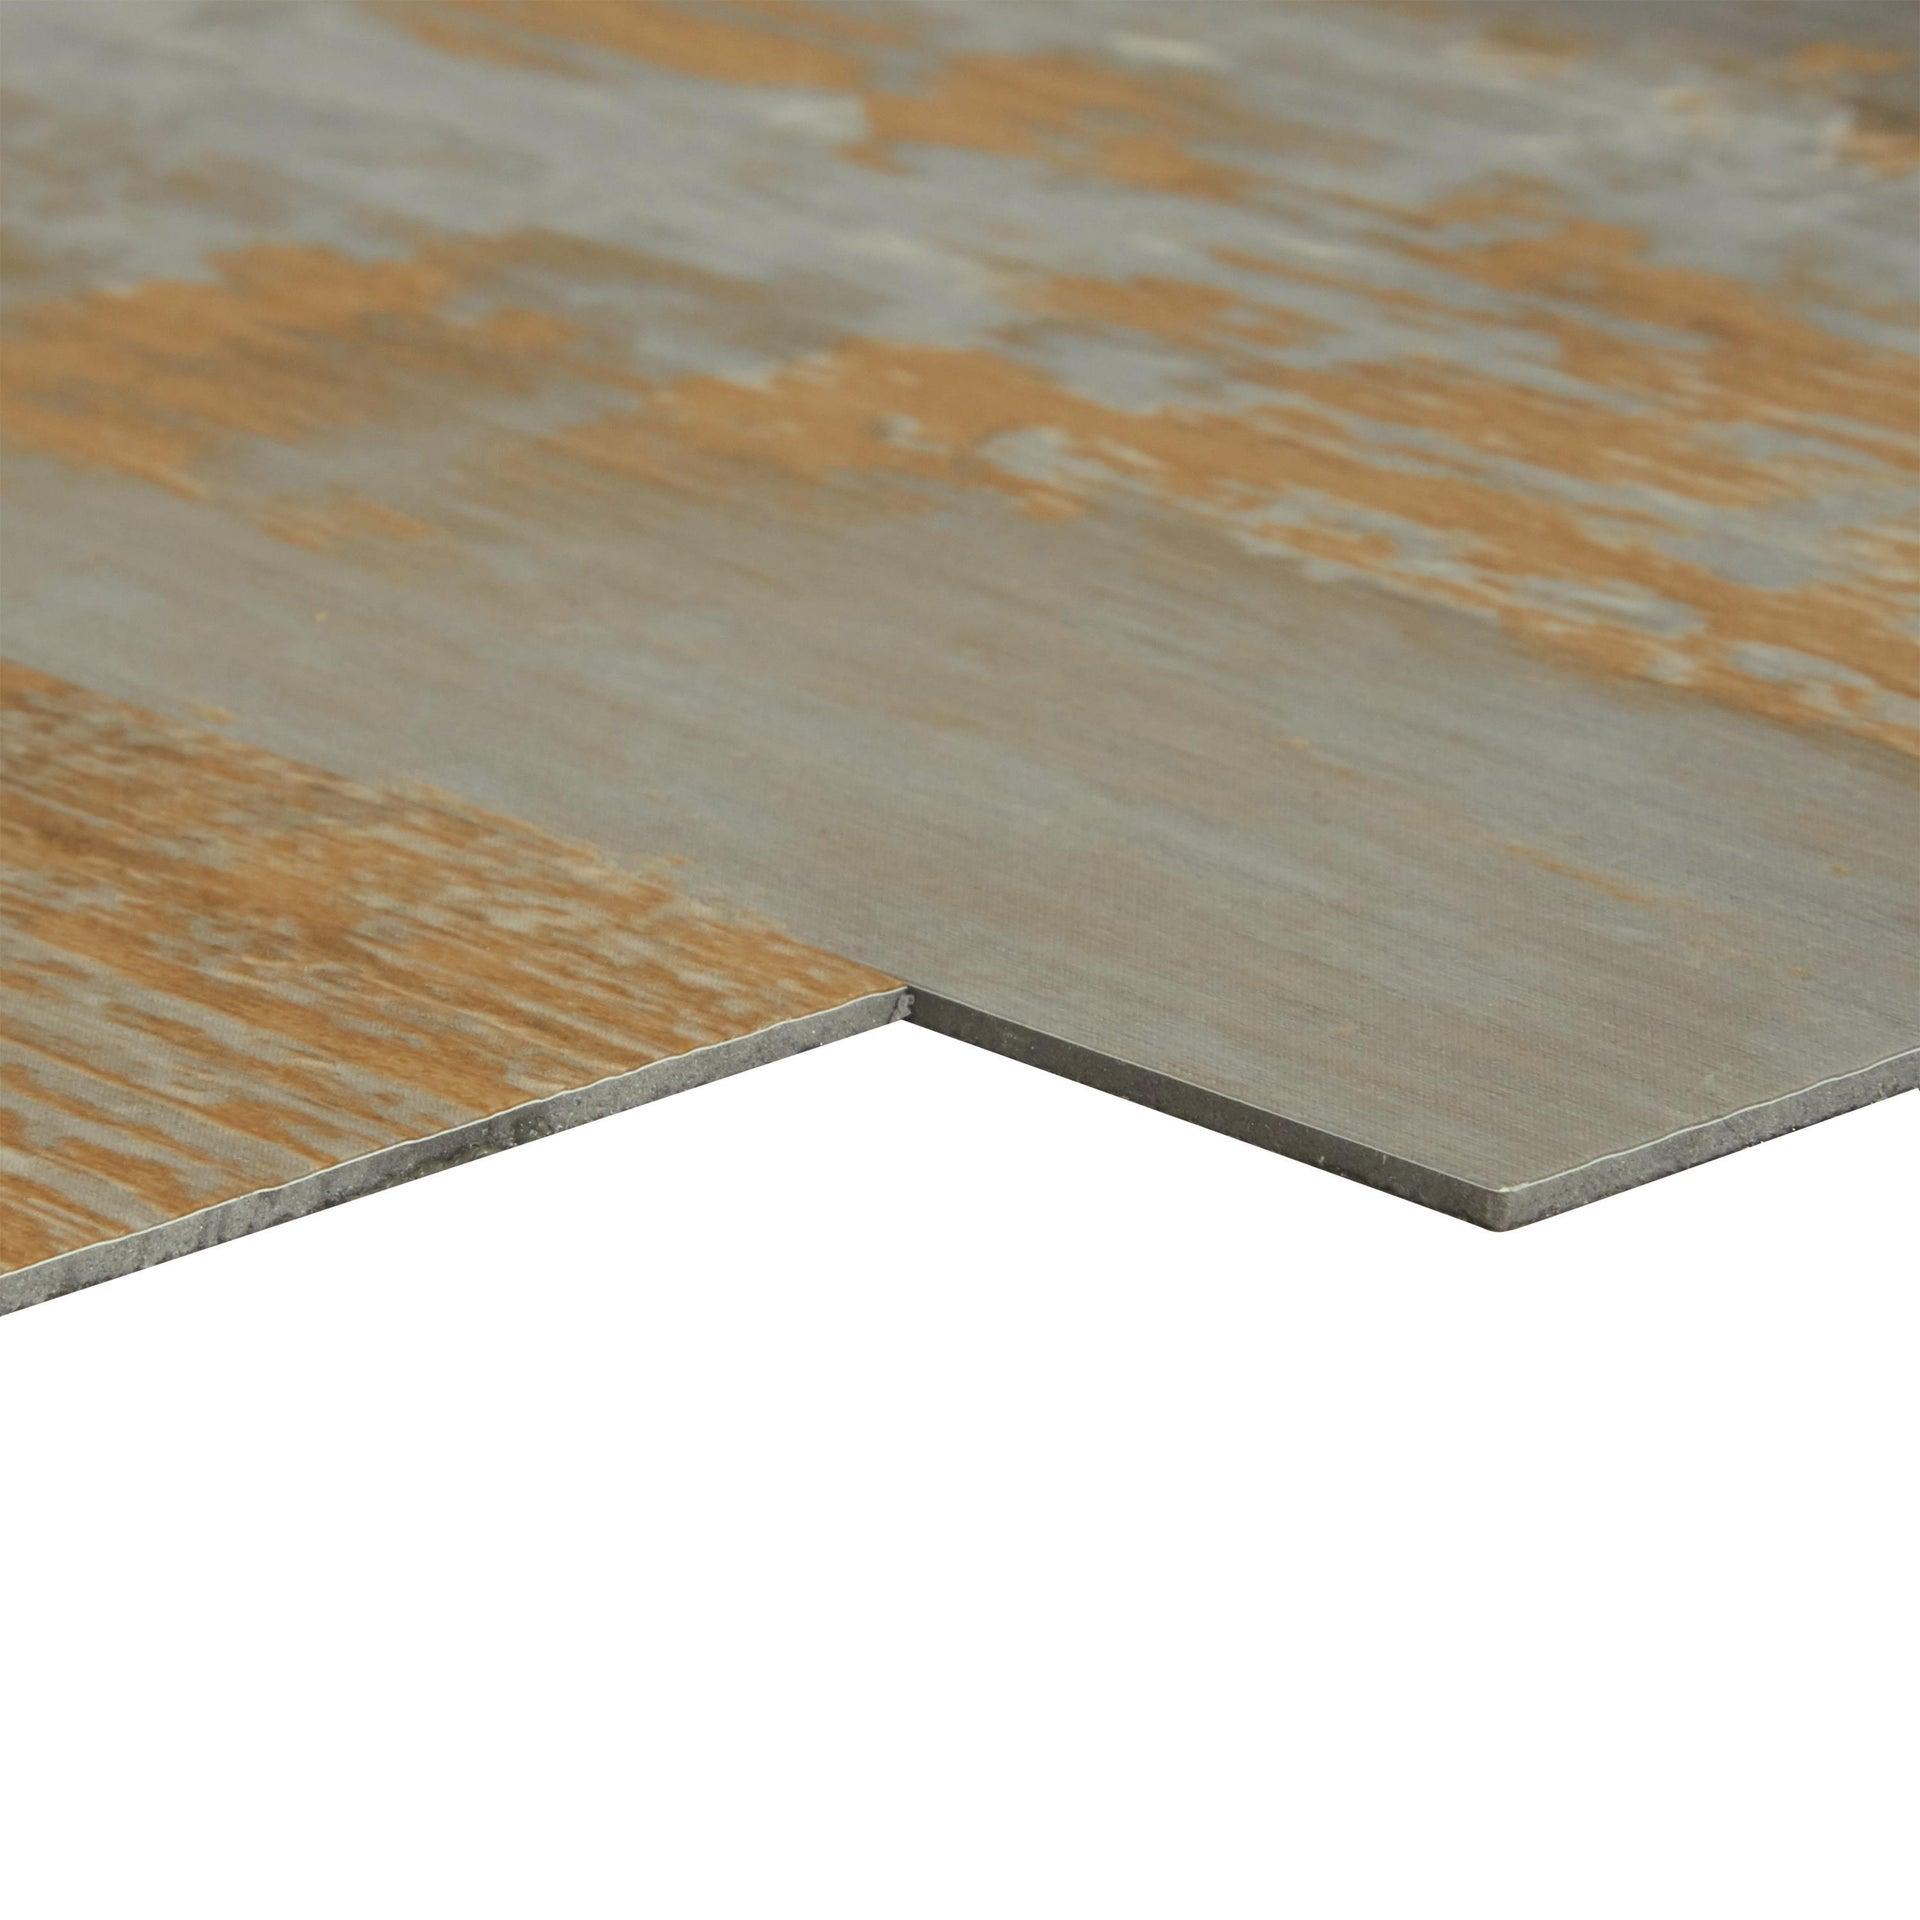 Pavimento PVC adesivo Mungo Sp 2 mm giallo / dorato - 3